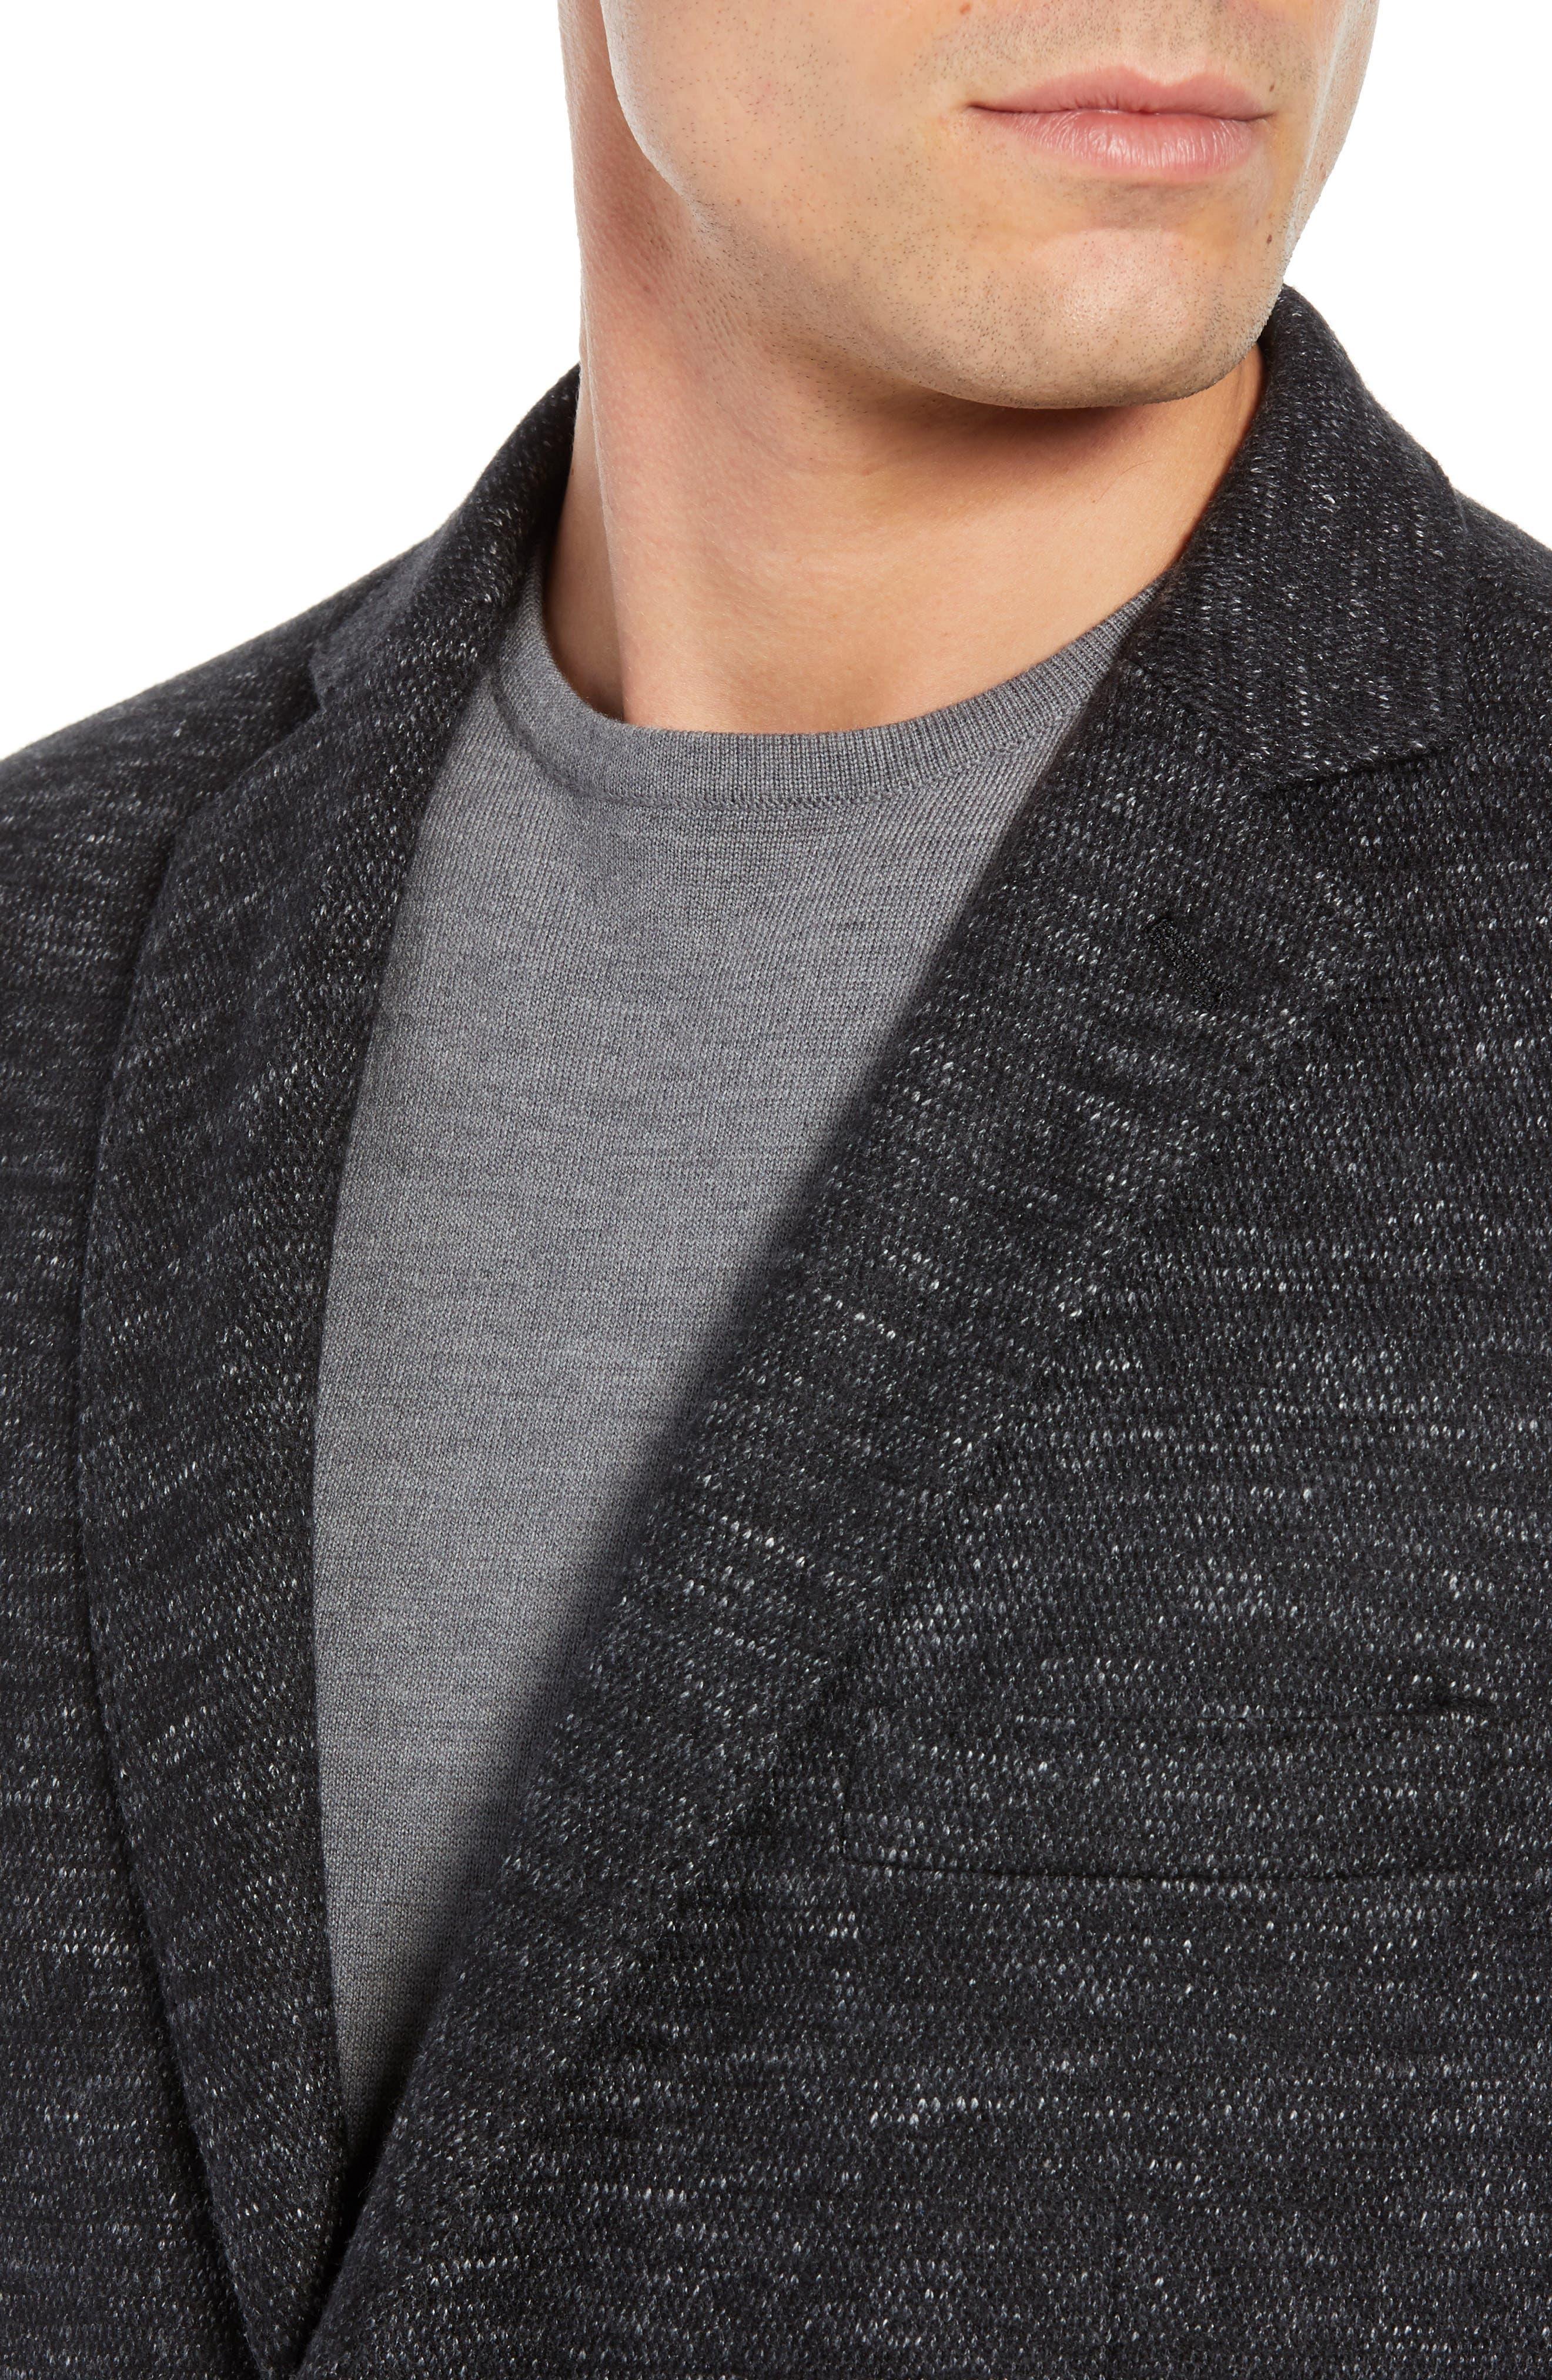 Regular Fit Knit Wool Blend Sport Coat,                             Alternate thumbnail 4, color,                             CHARCOAL